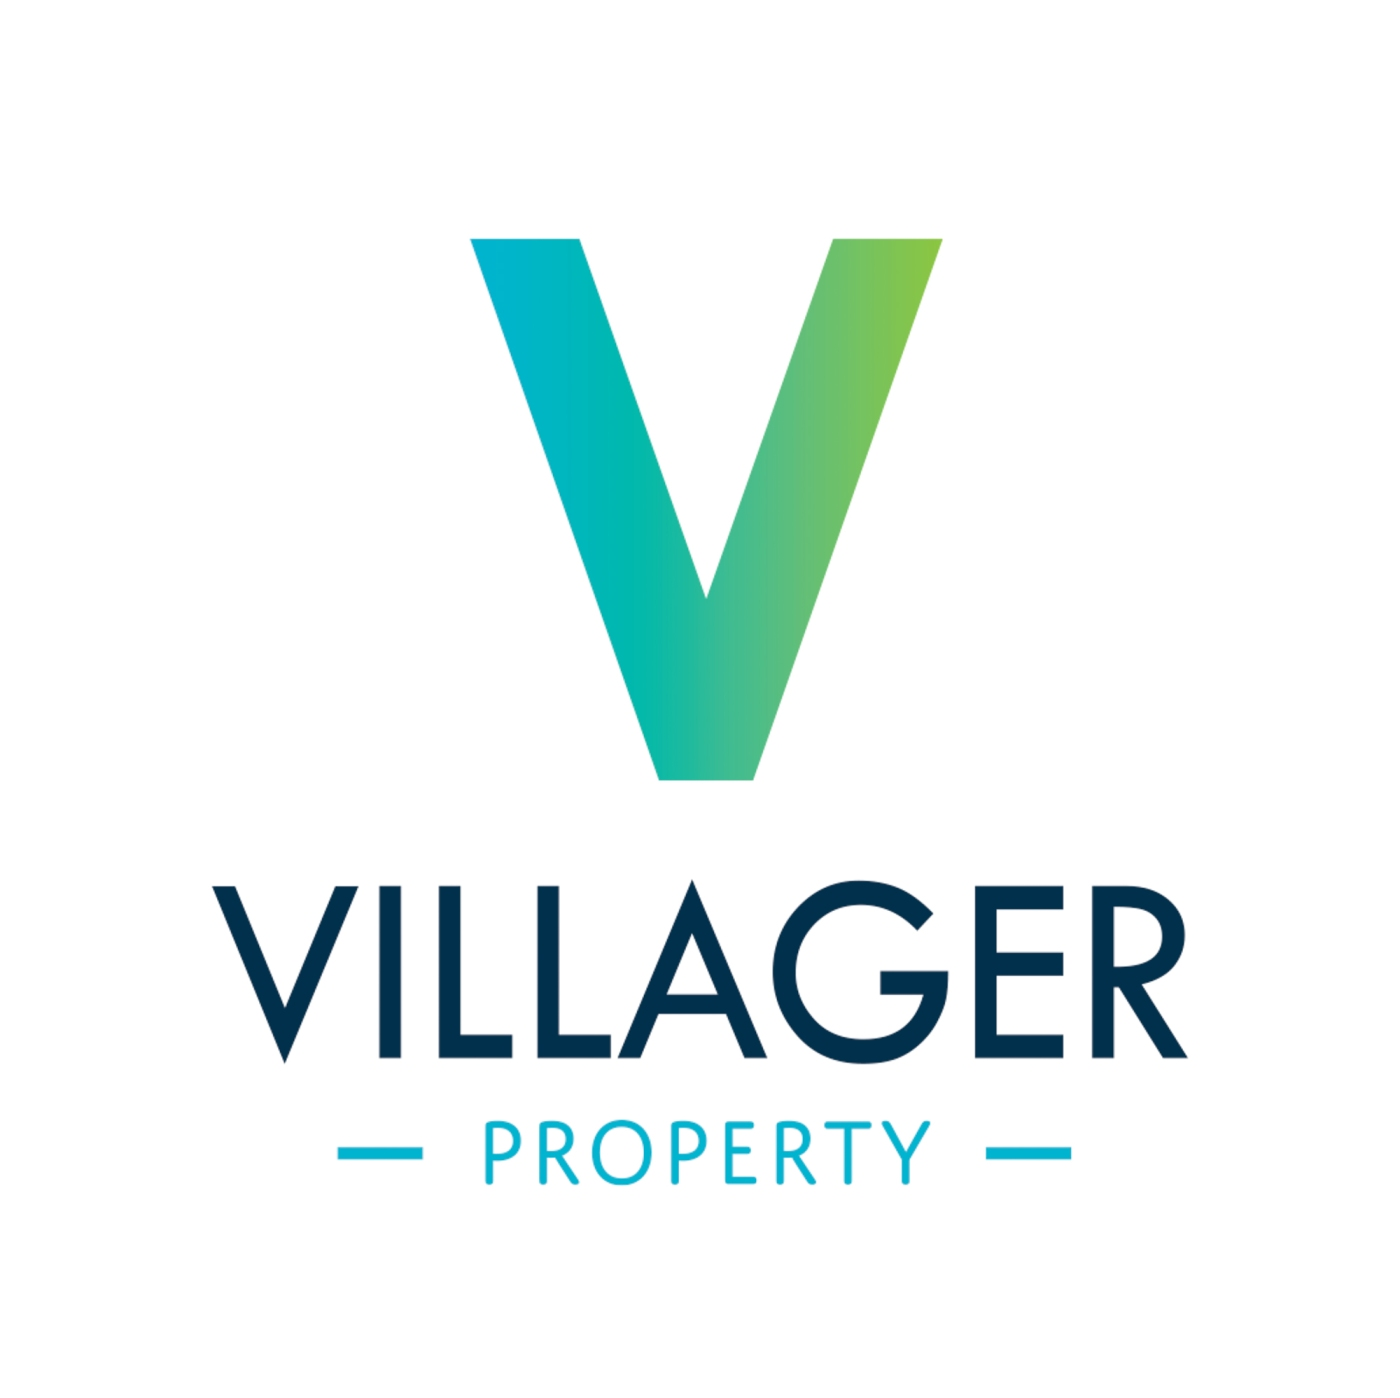 villager logo jpg 5k